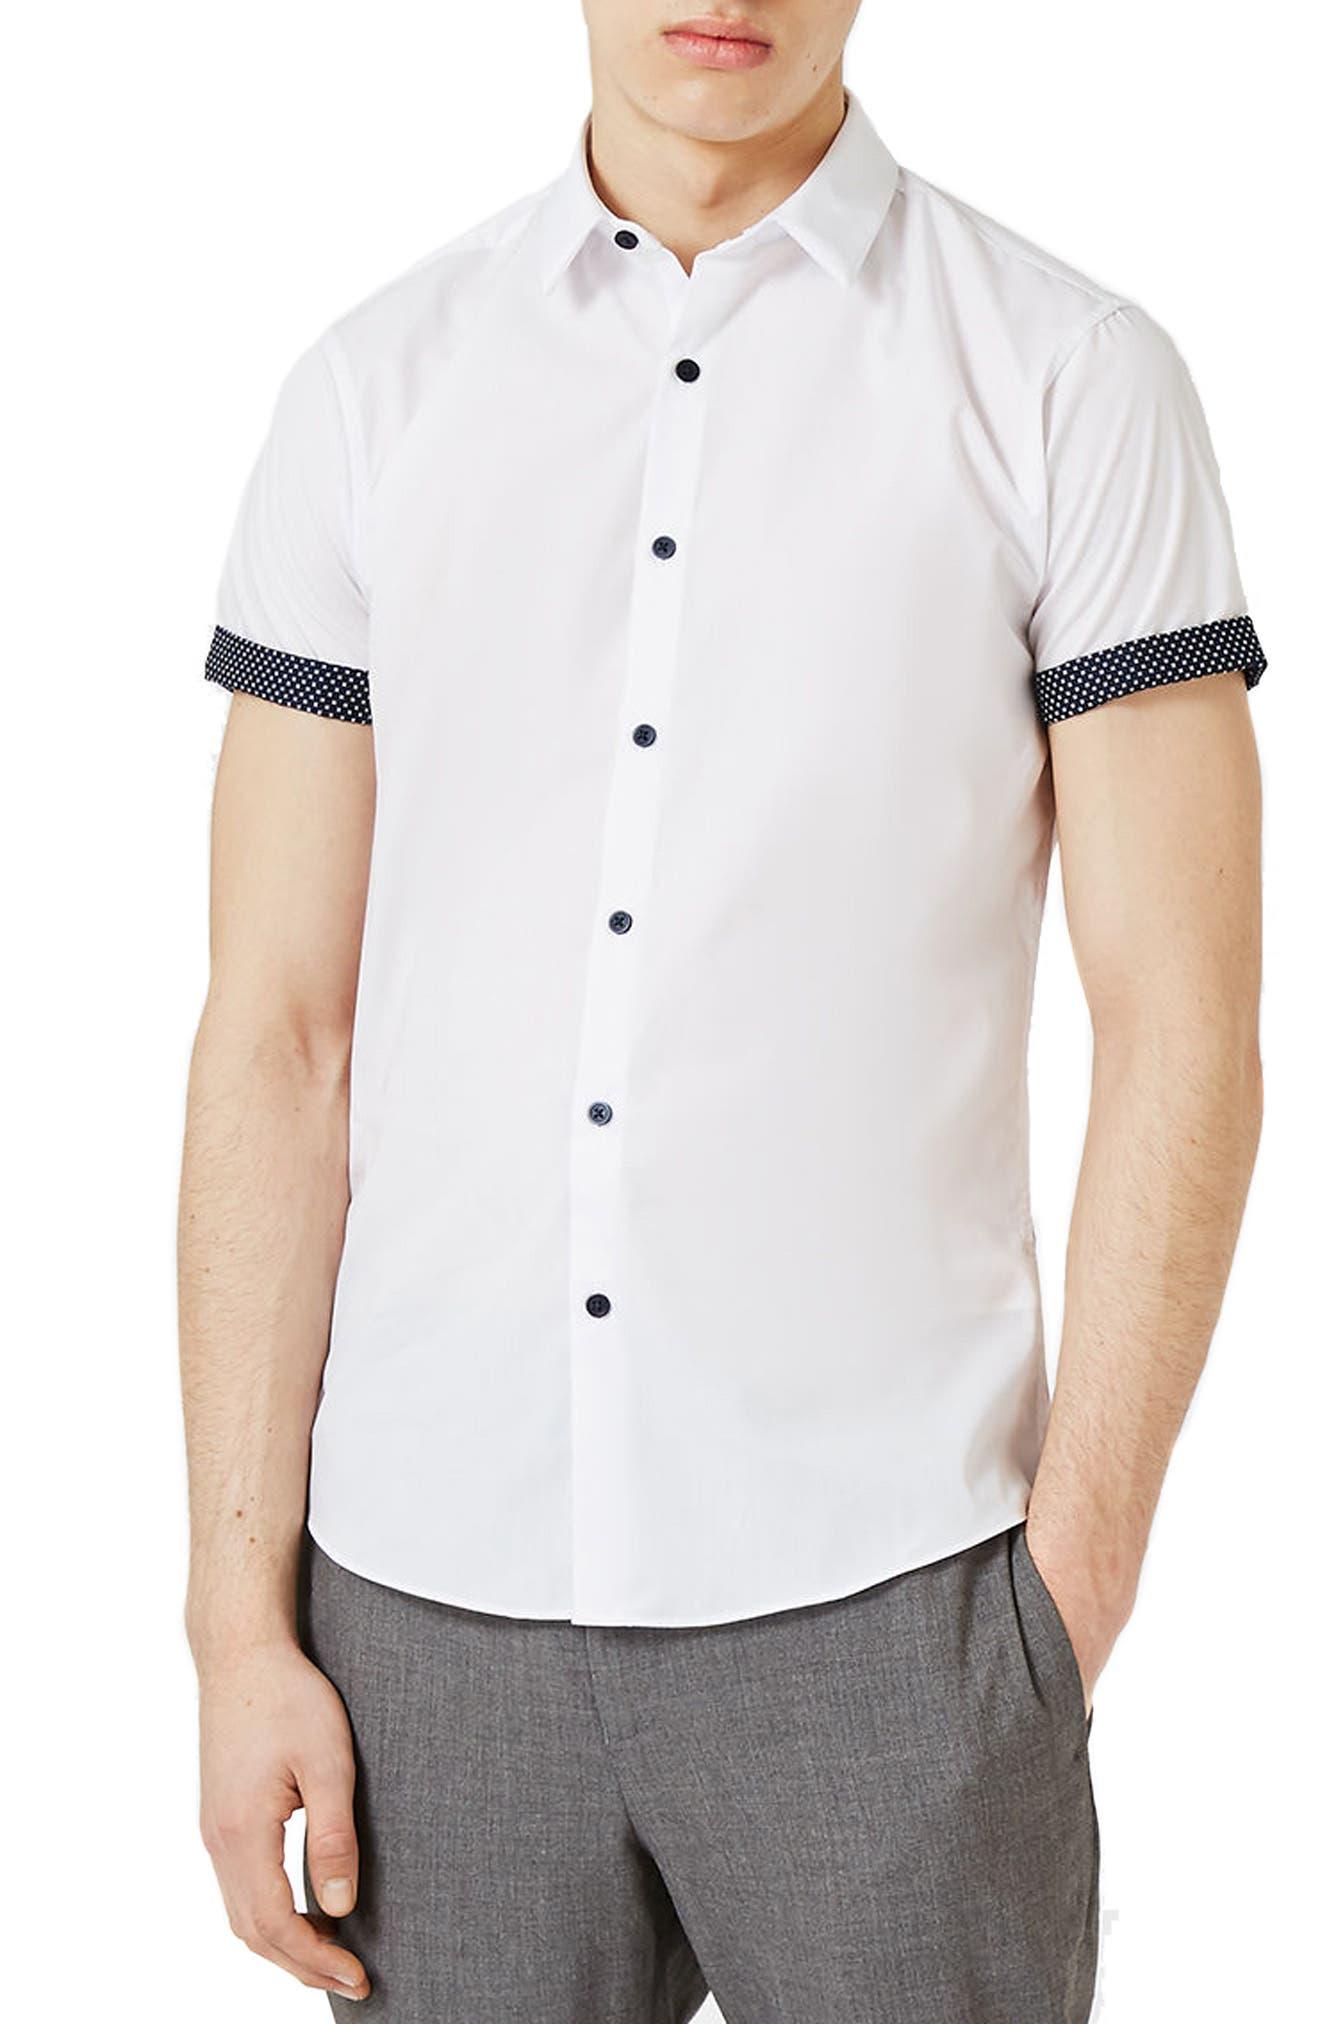 Dot Cuff Shirt,                             Main thumbnail 1, color,                             White Multi